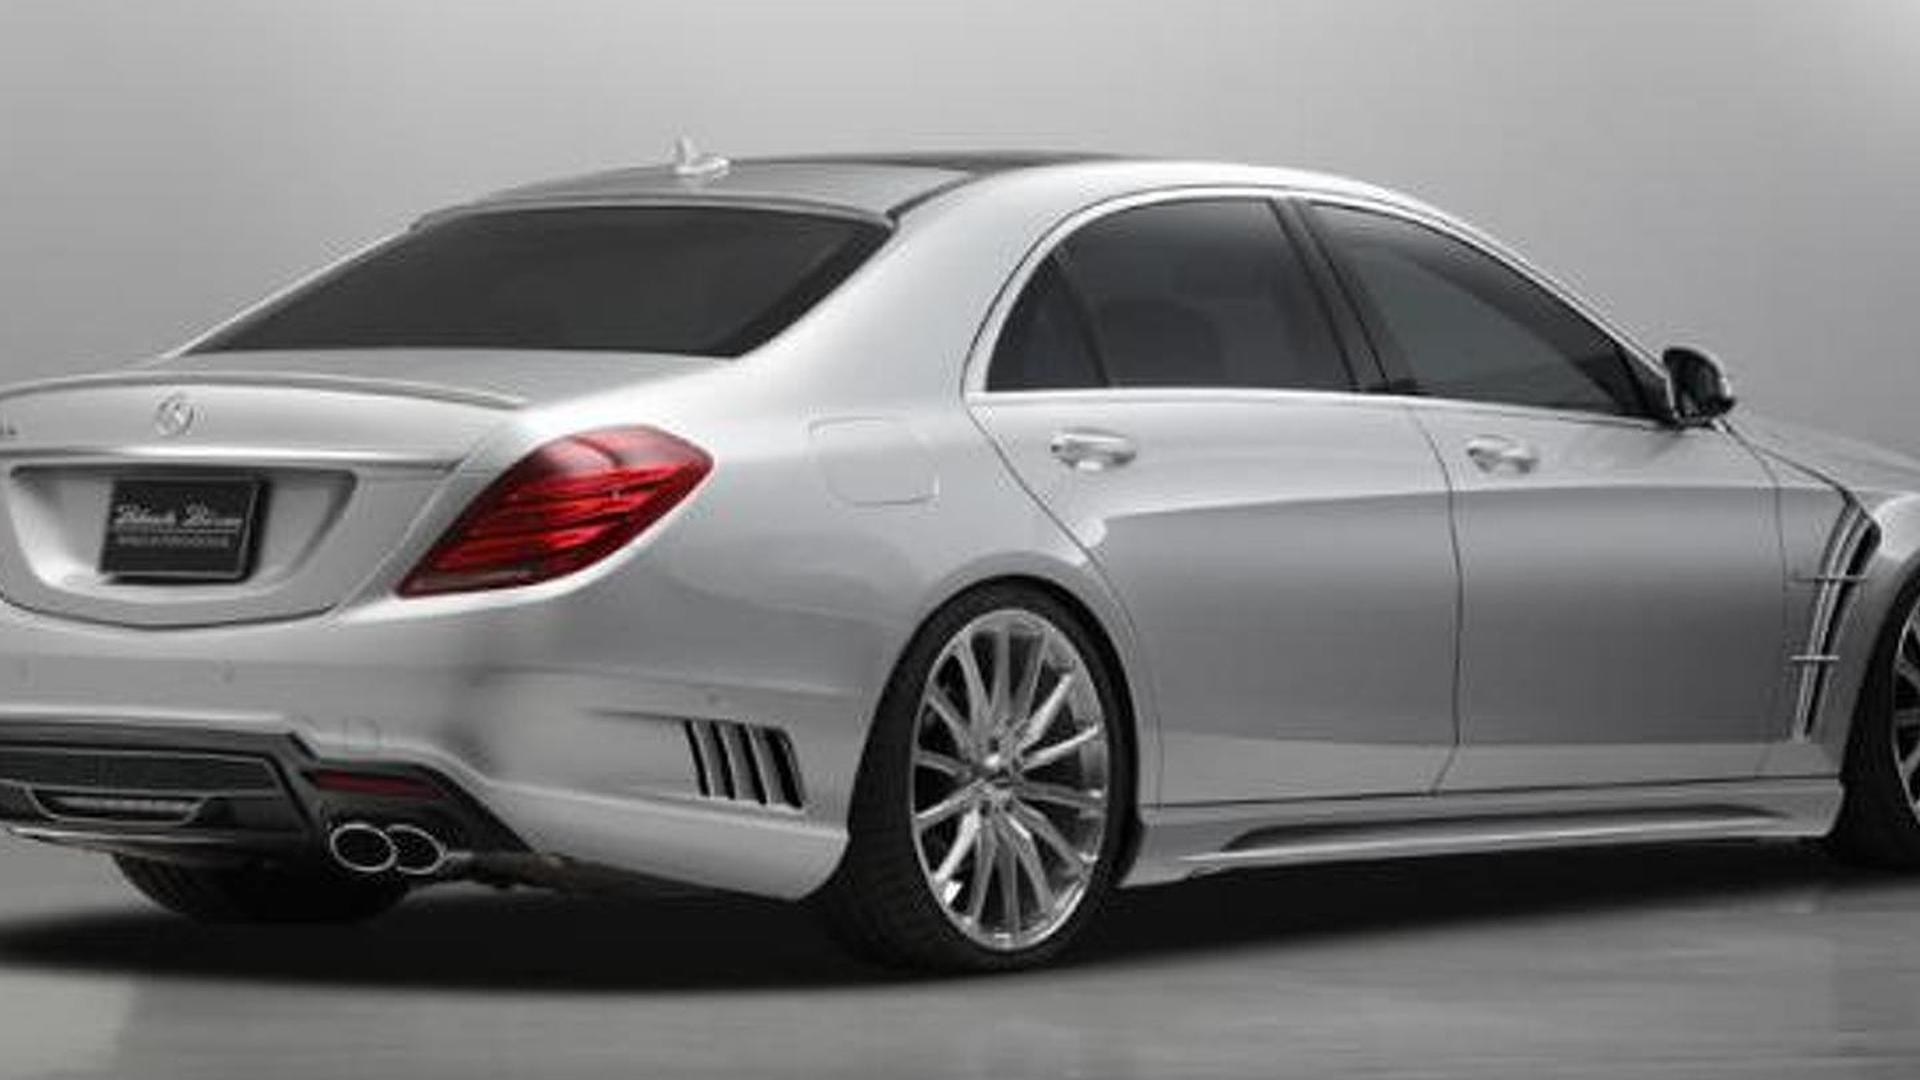 Wald international updates kit for 2014 mercedes benz s class for Mercedes benz us international